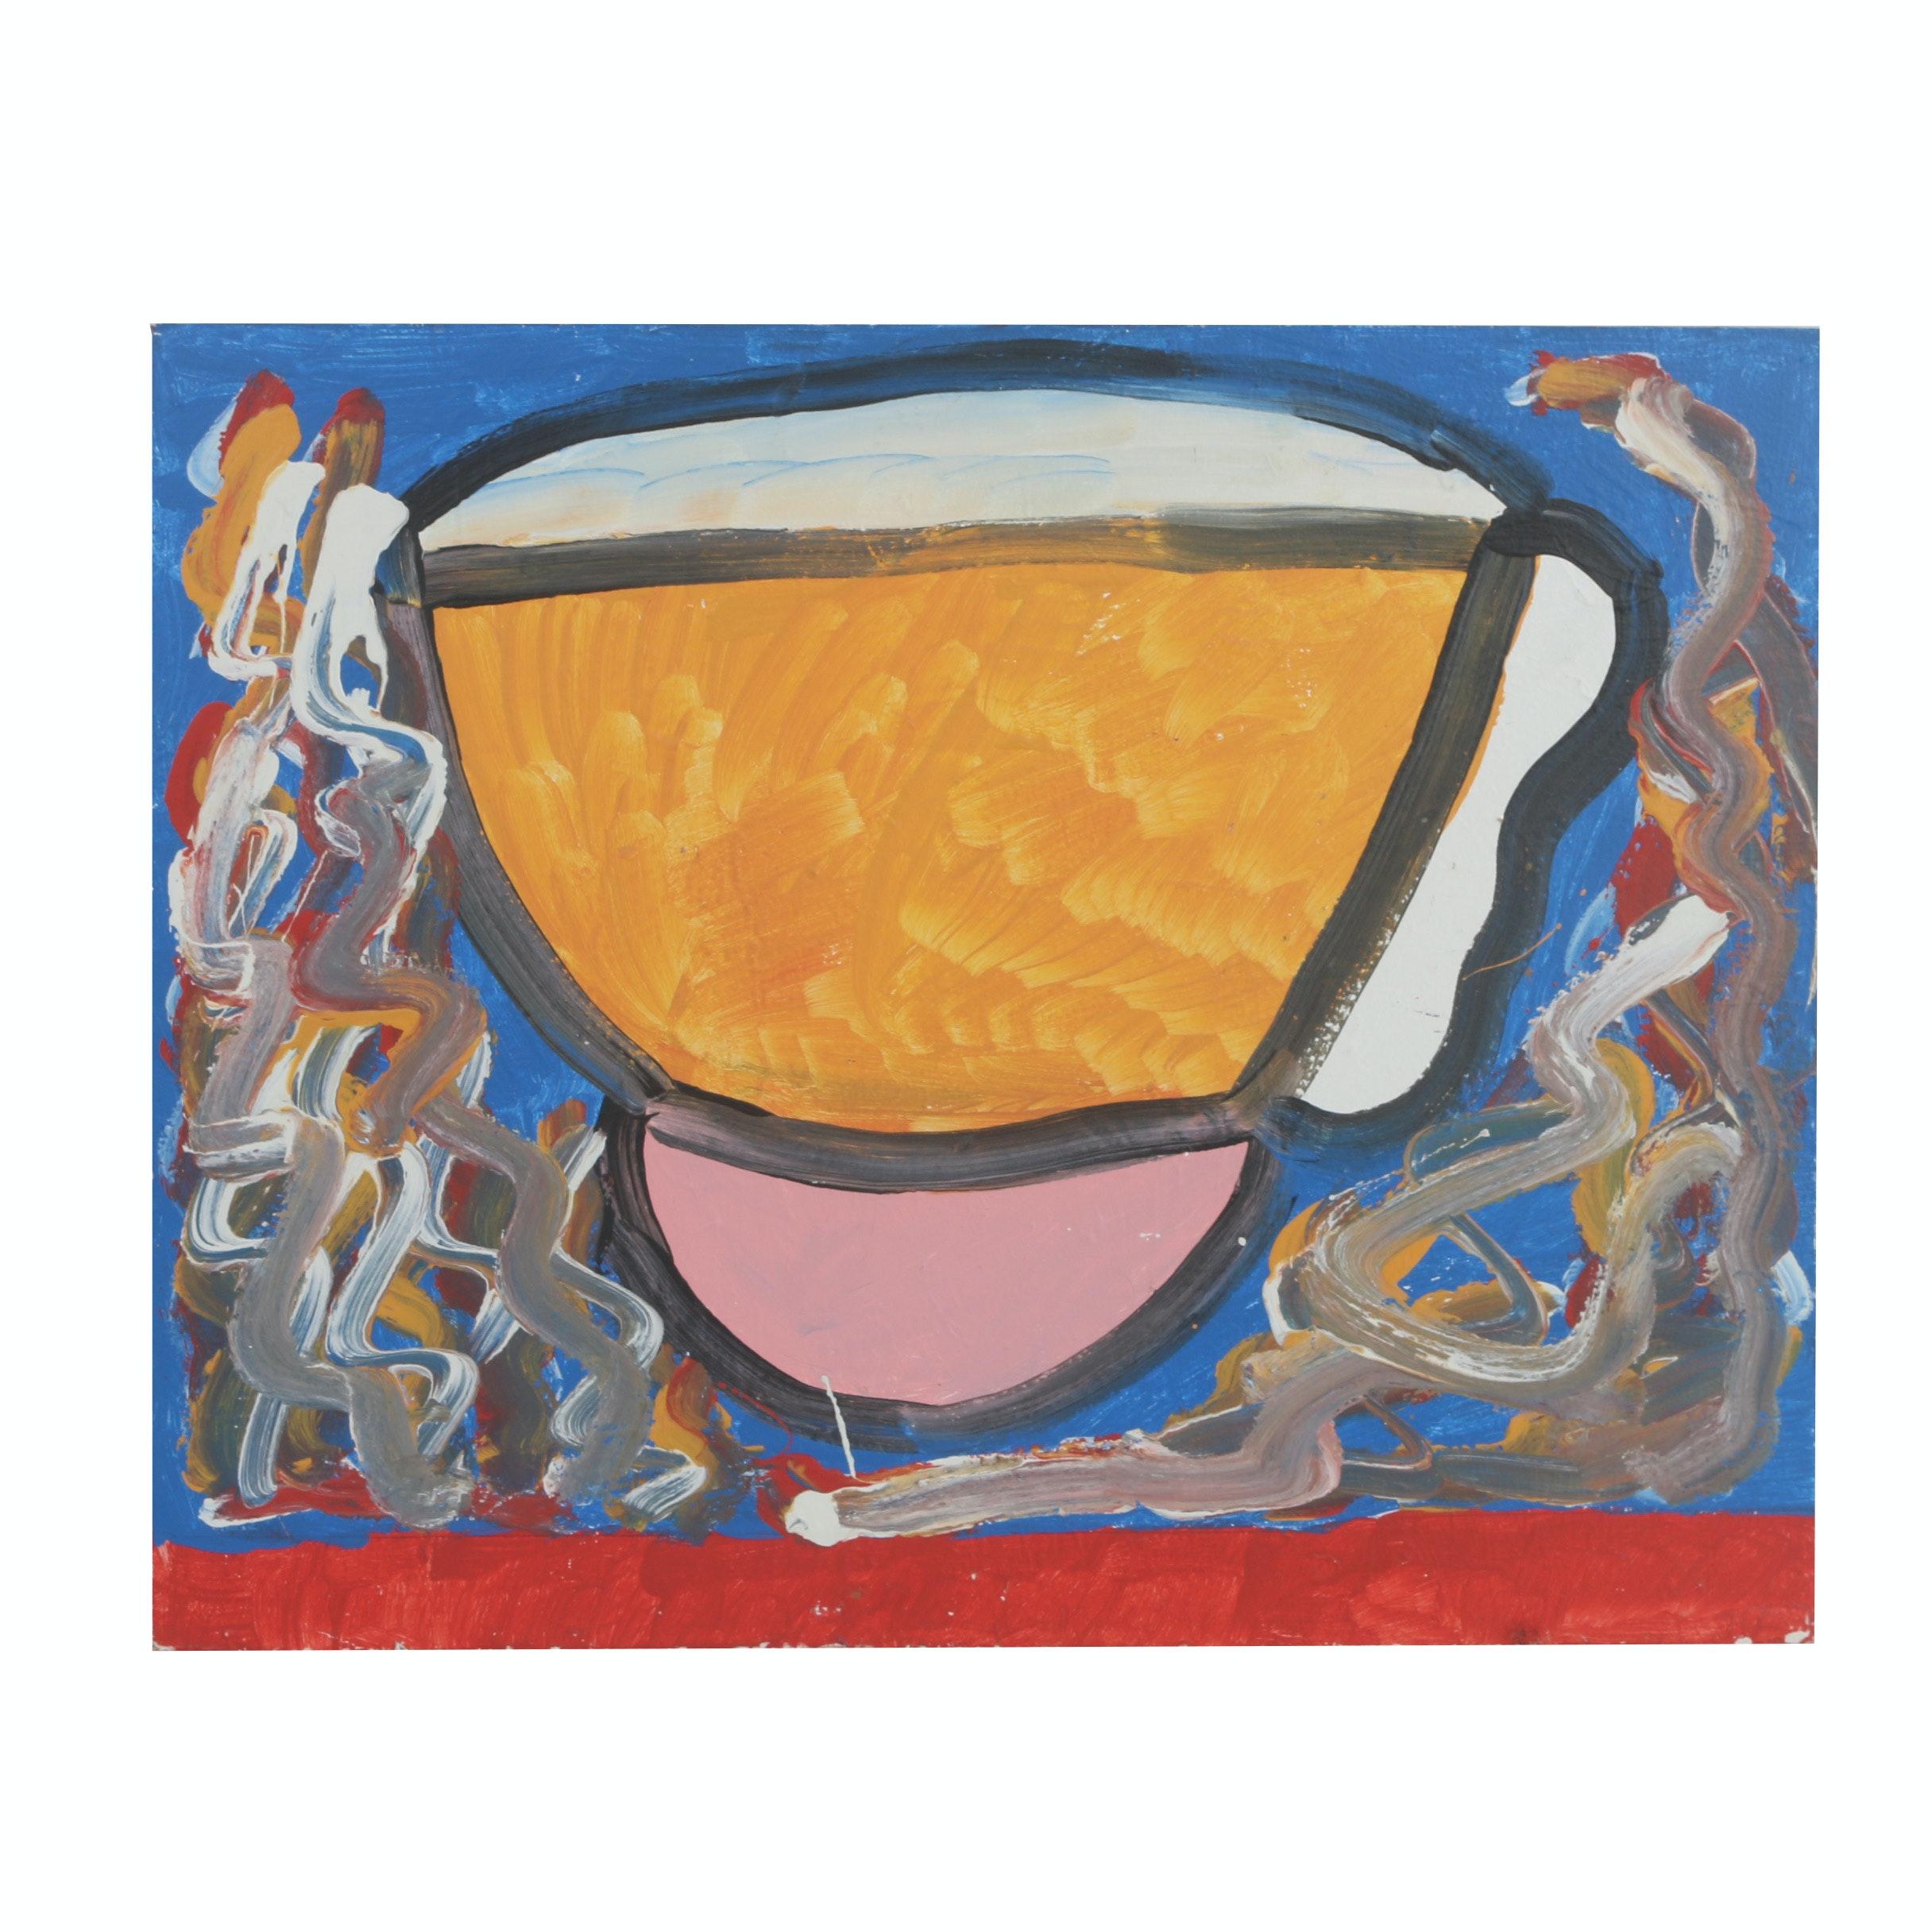 "Curtis Davis 2018 Acrylic Painting on Wood ""Bowl"""